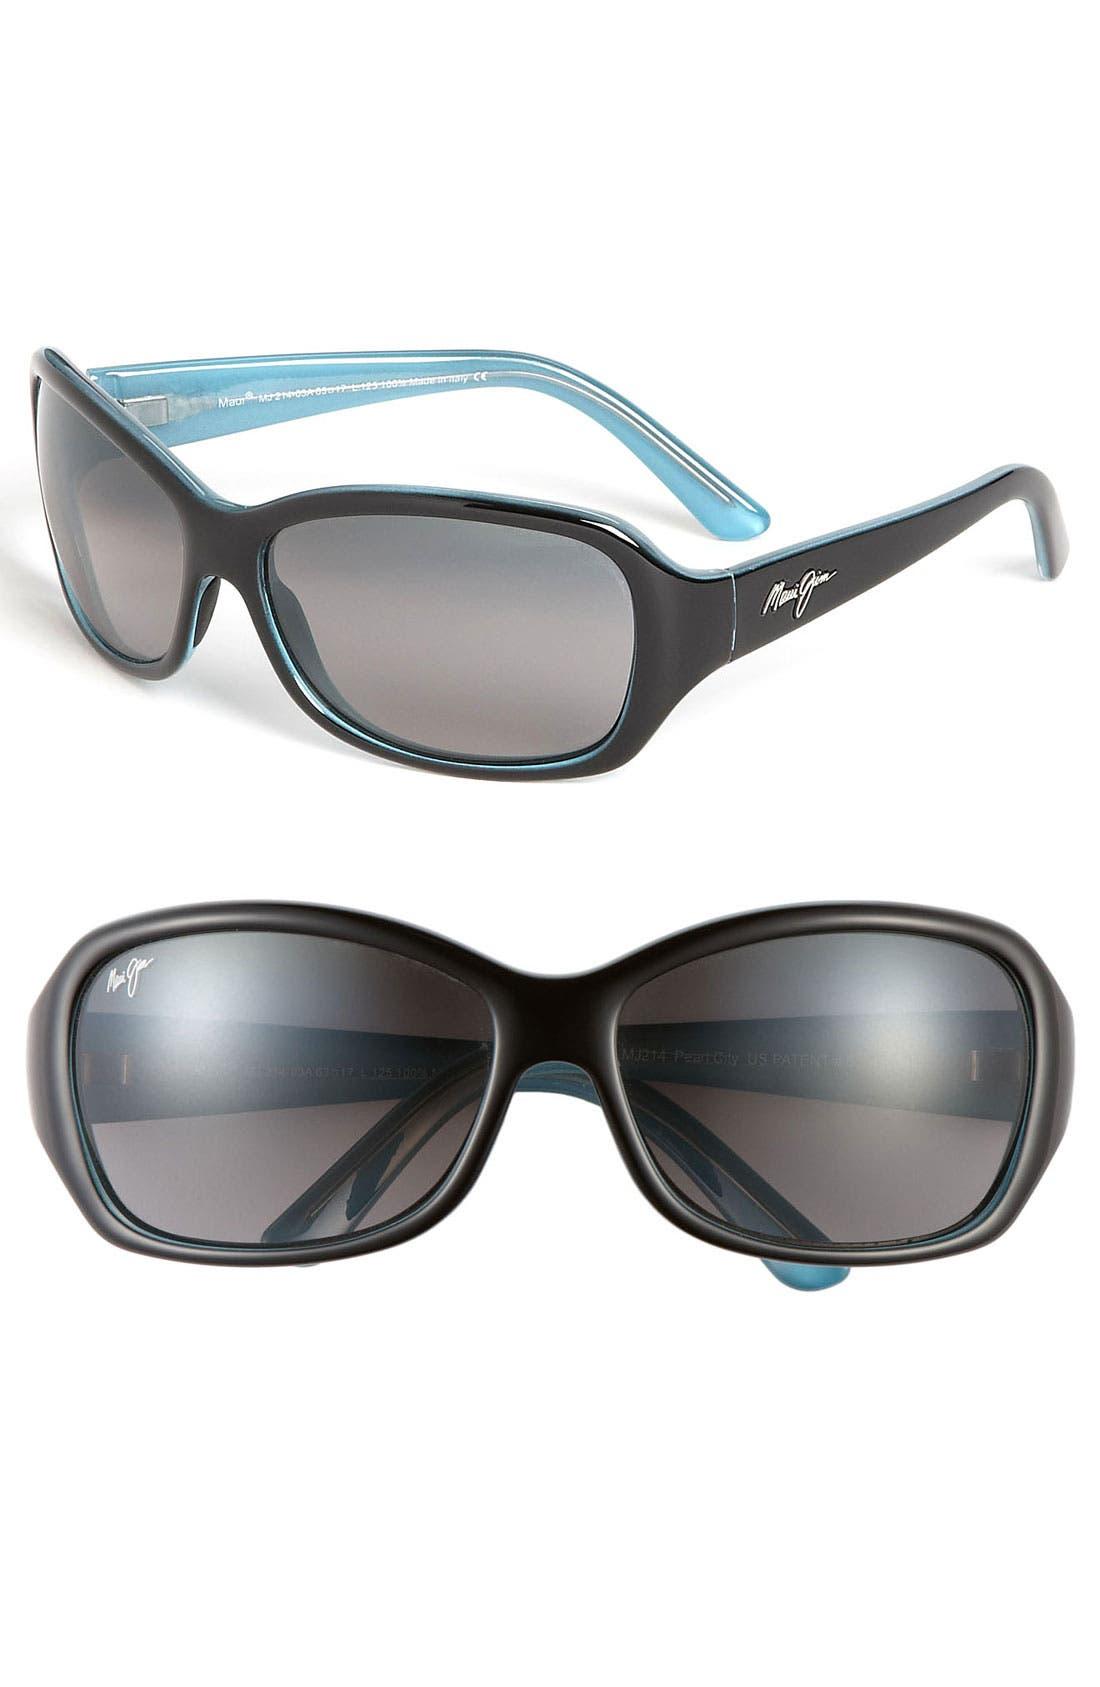 Maui Jim Pearl City 6m Polarizedplus2 Sunglasses -